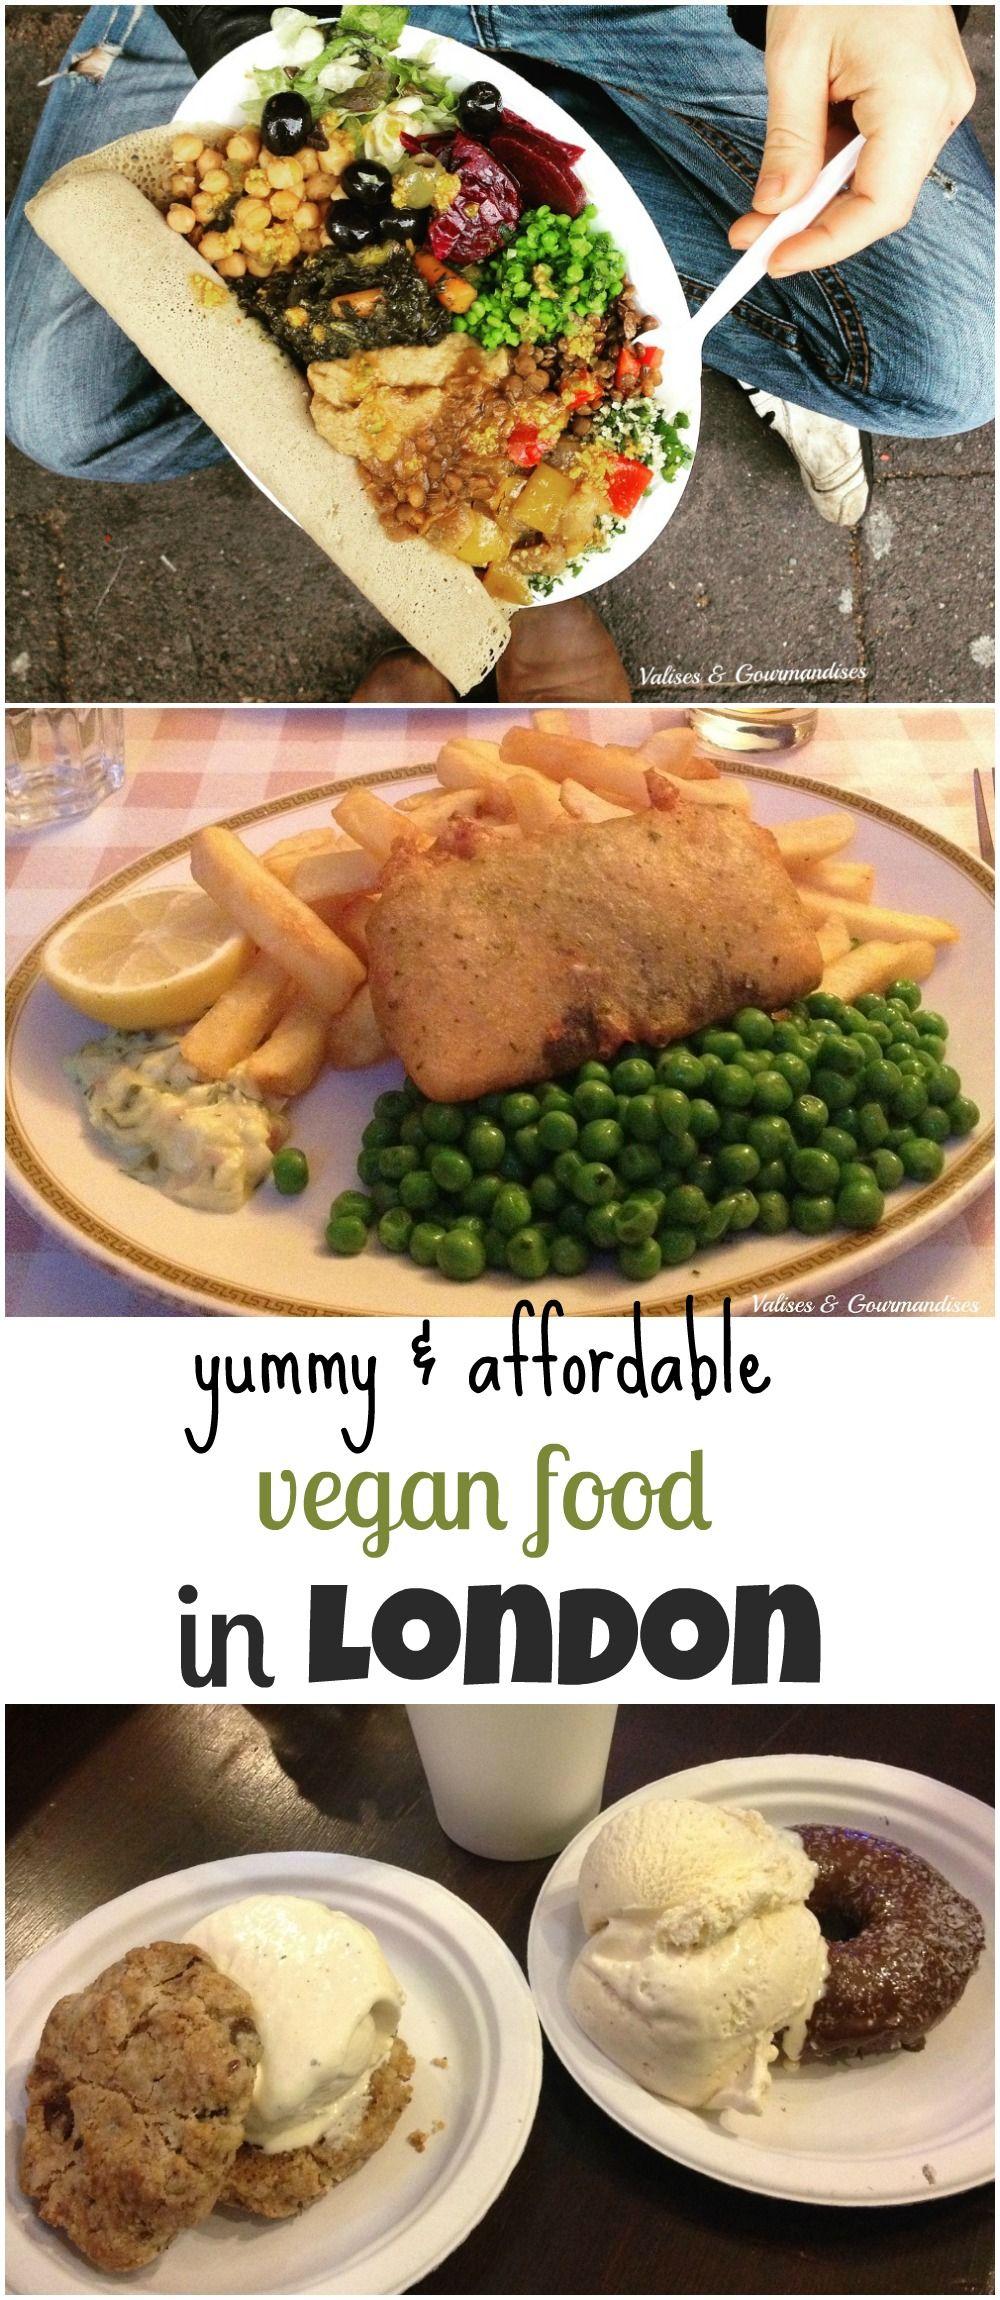 Vegan Travels In London Valises Gourmandises London Food Vegan London Food Reviews